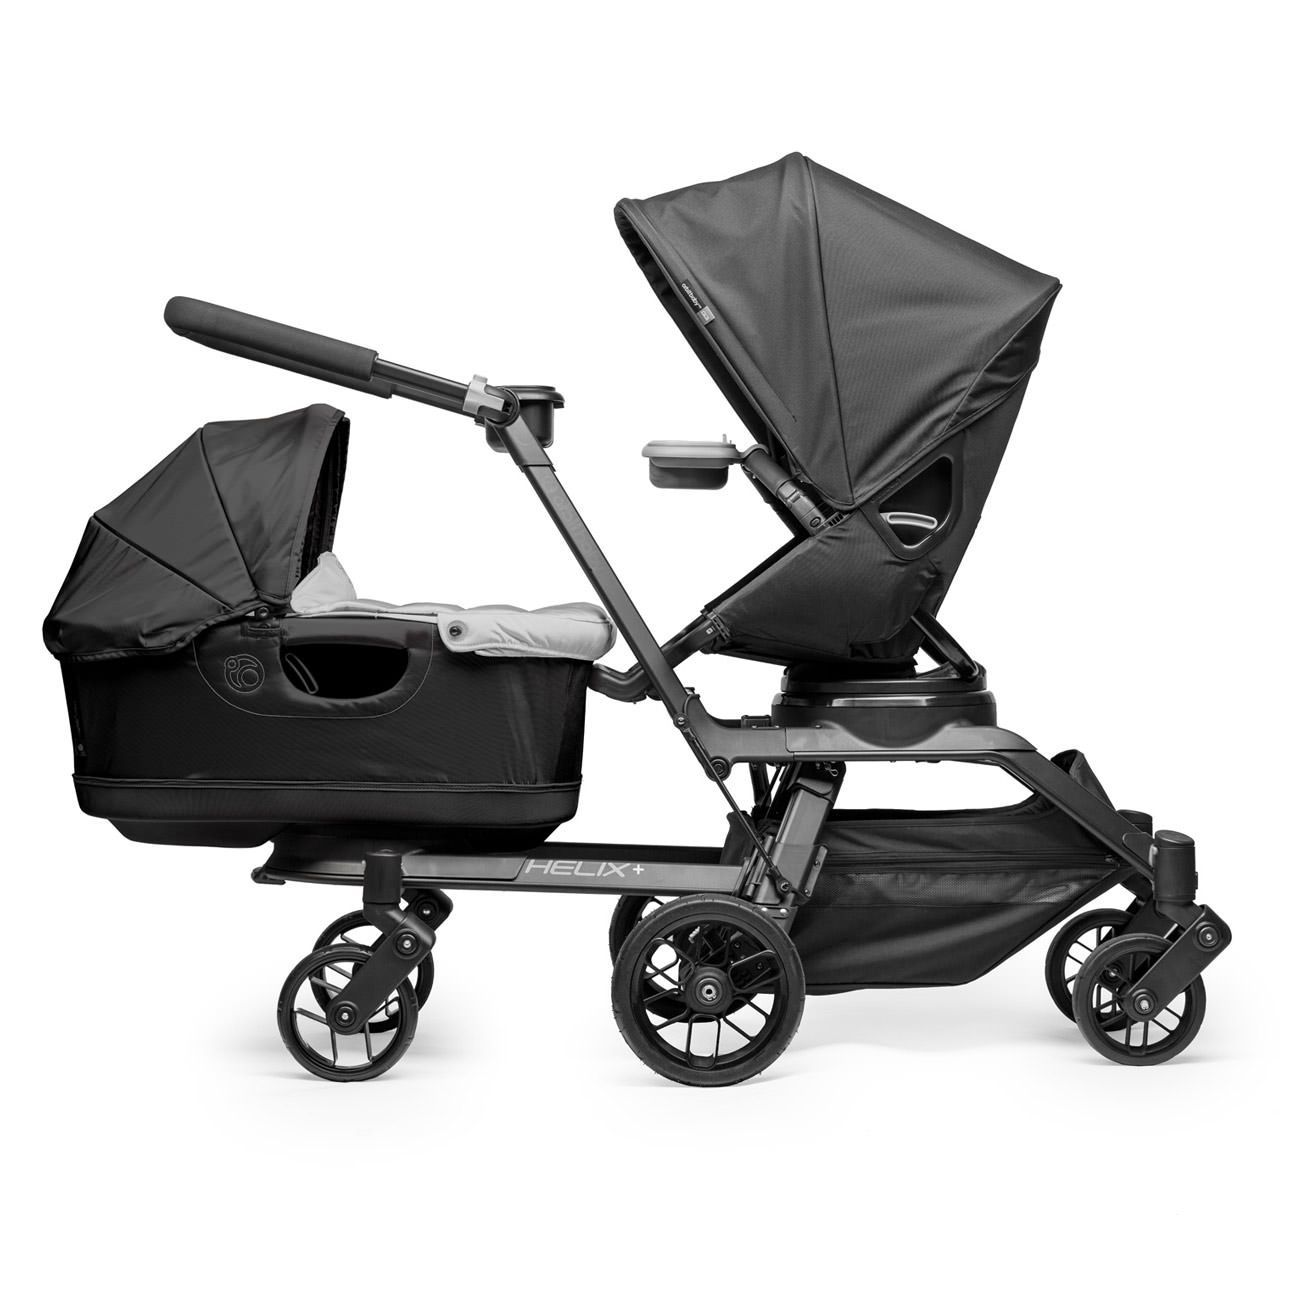 Orbit Baby Double Helix Stroller Frame Orbit Baby (With